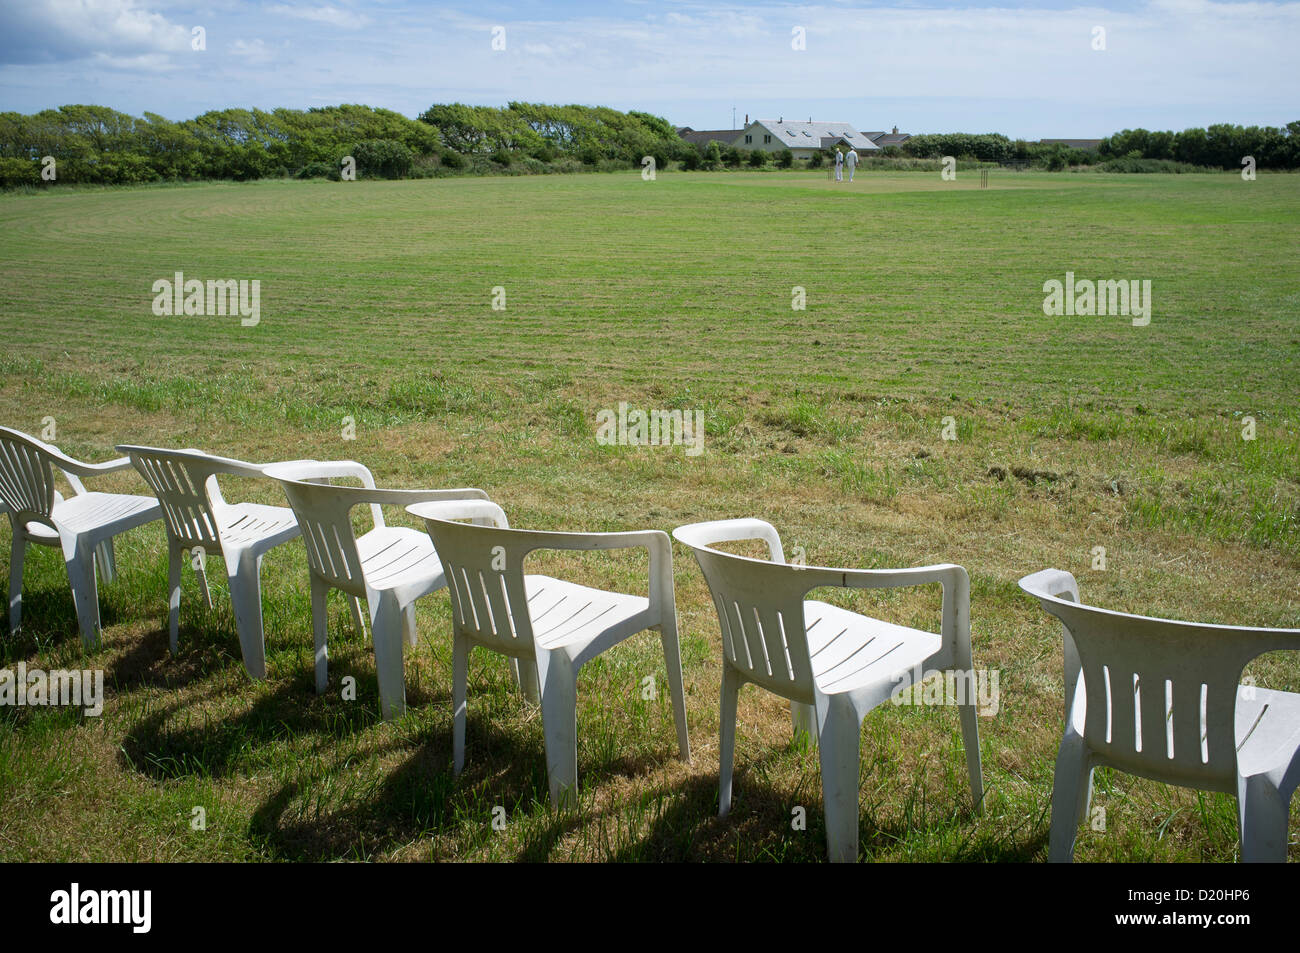 Village cricket match in East Prawle, South Devon - Stock Image